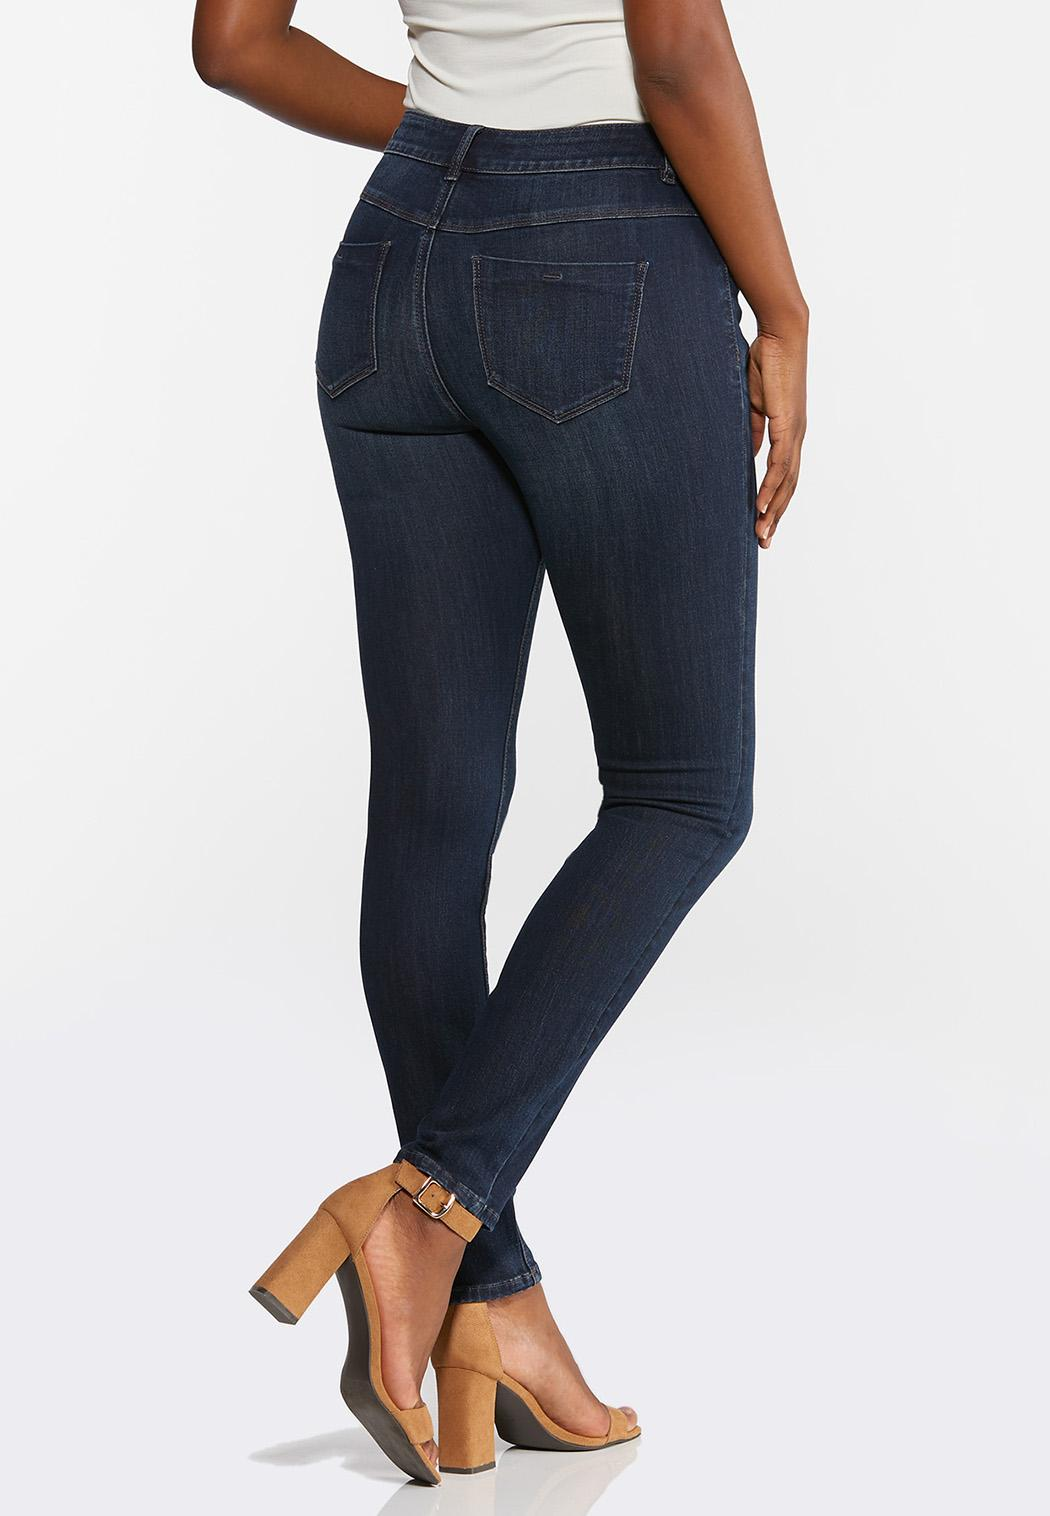 Petite Dark Wash Skinny Jeans (Item #44348436)